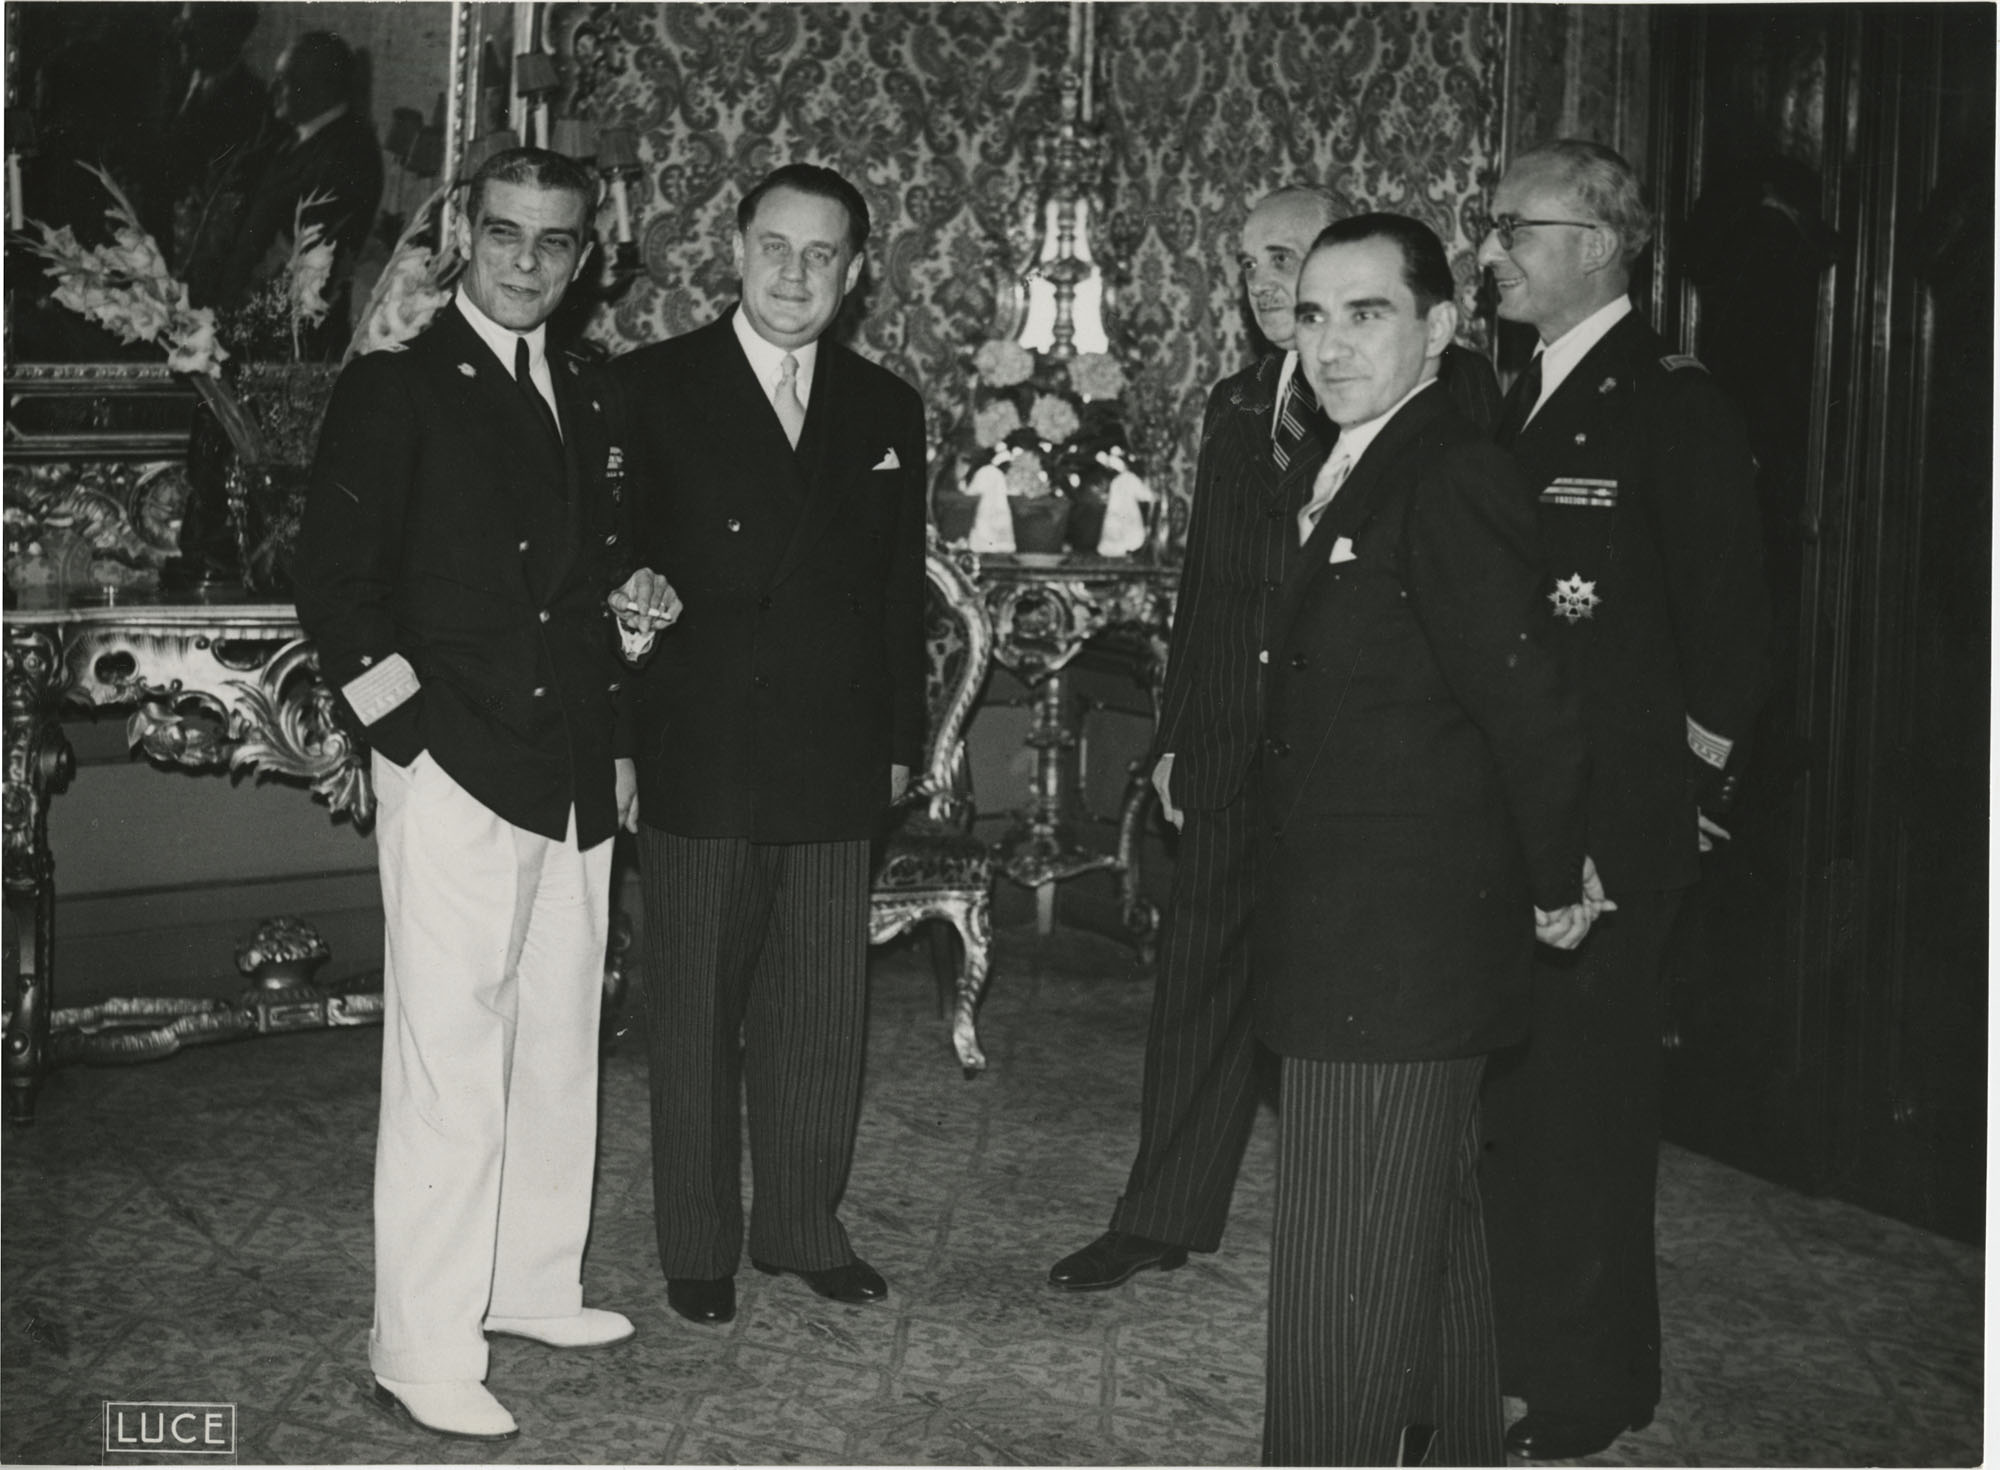 Mihai Antonescu's visit to Benito Mussolini, Photograph 32